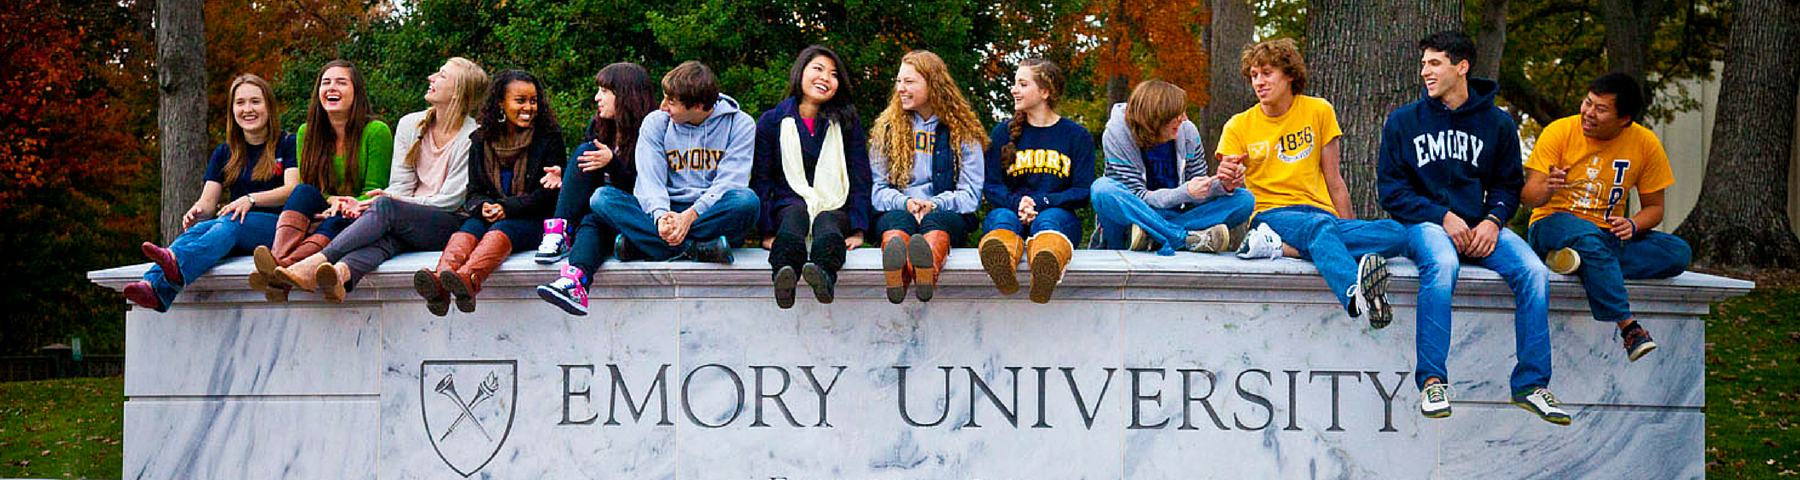 Emory University Banner